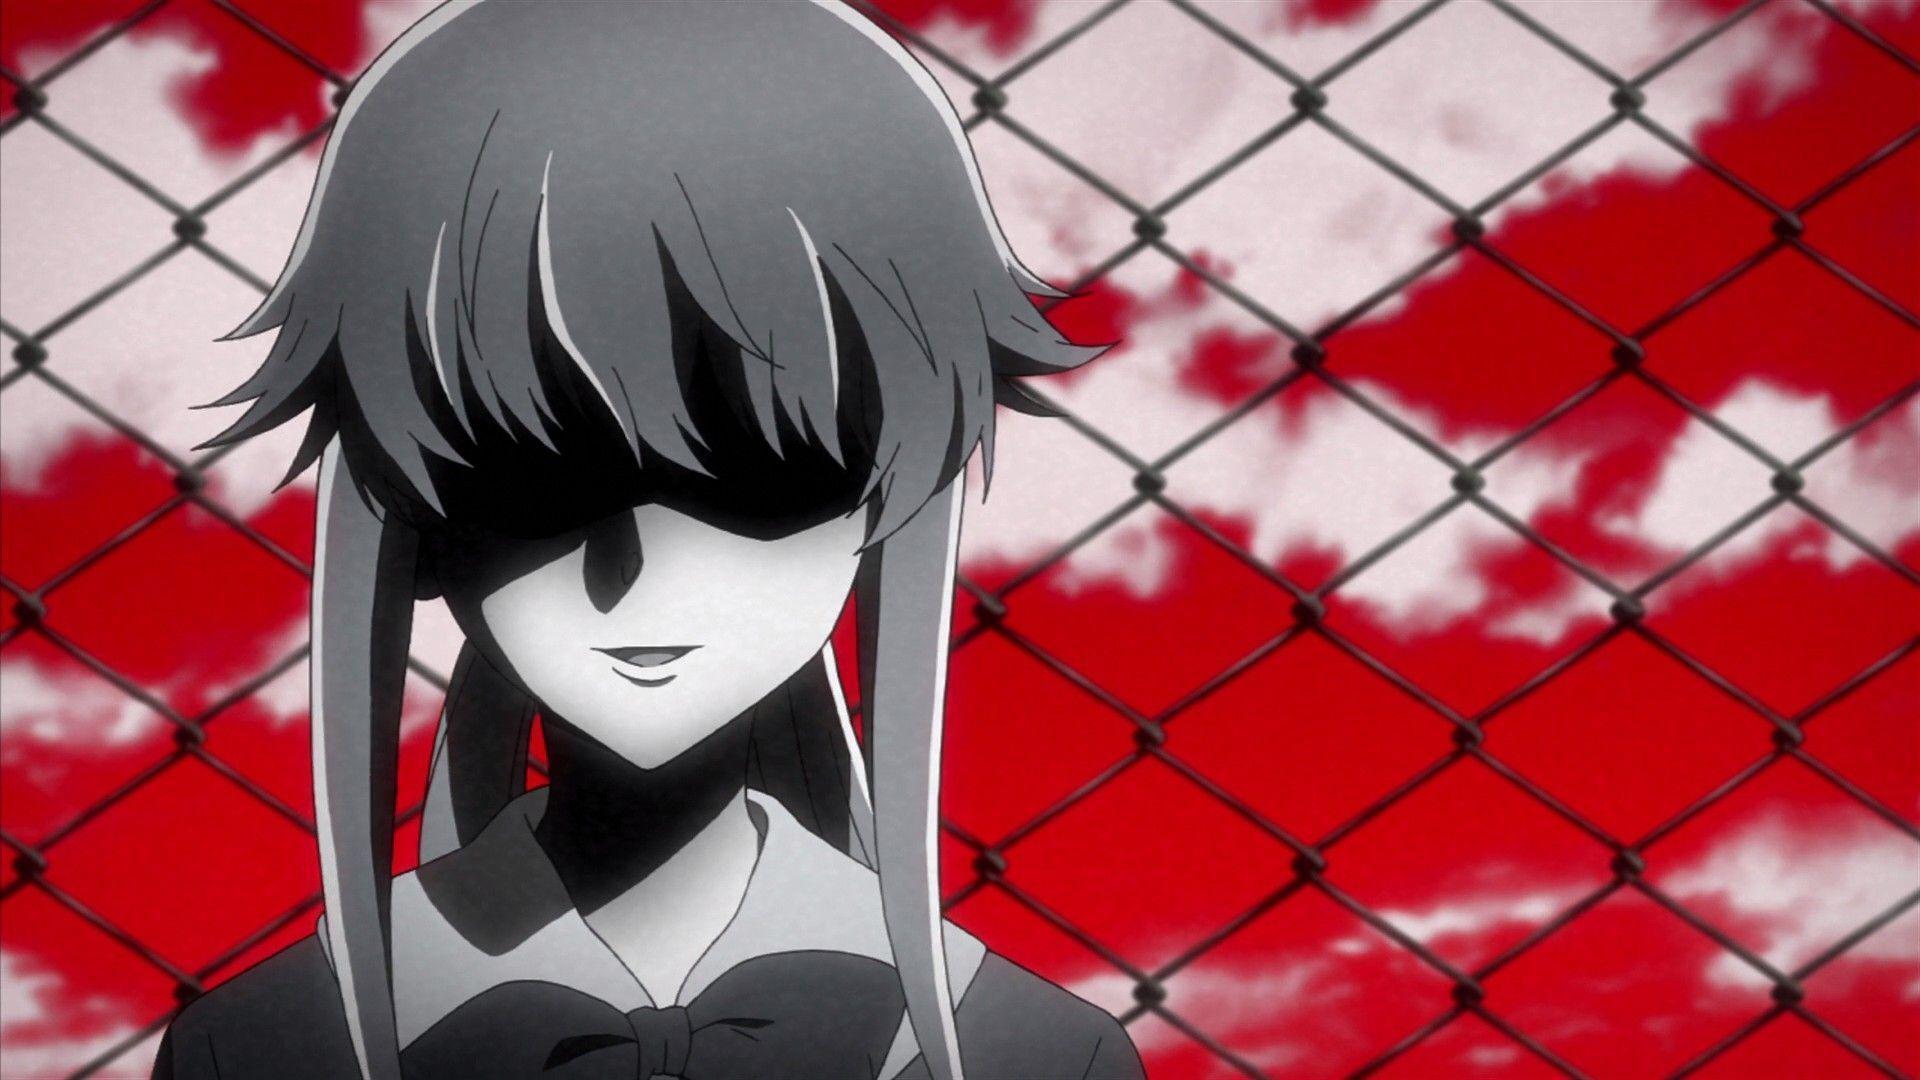 Mirai Nikki Gasai Yuno Yandere Anime Anime Girls: Mirai Nikki Wallpapers